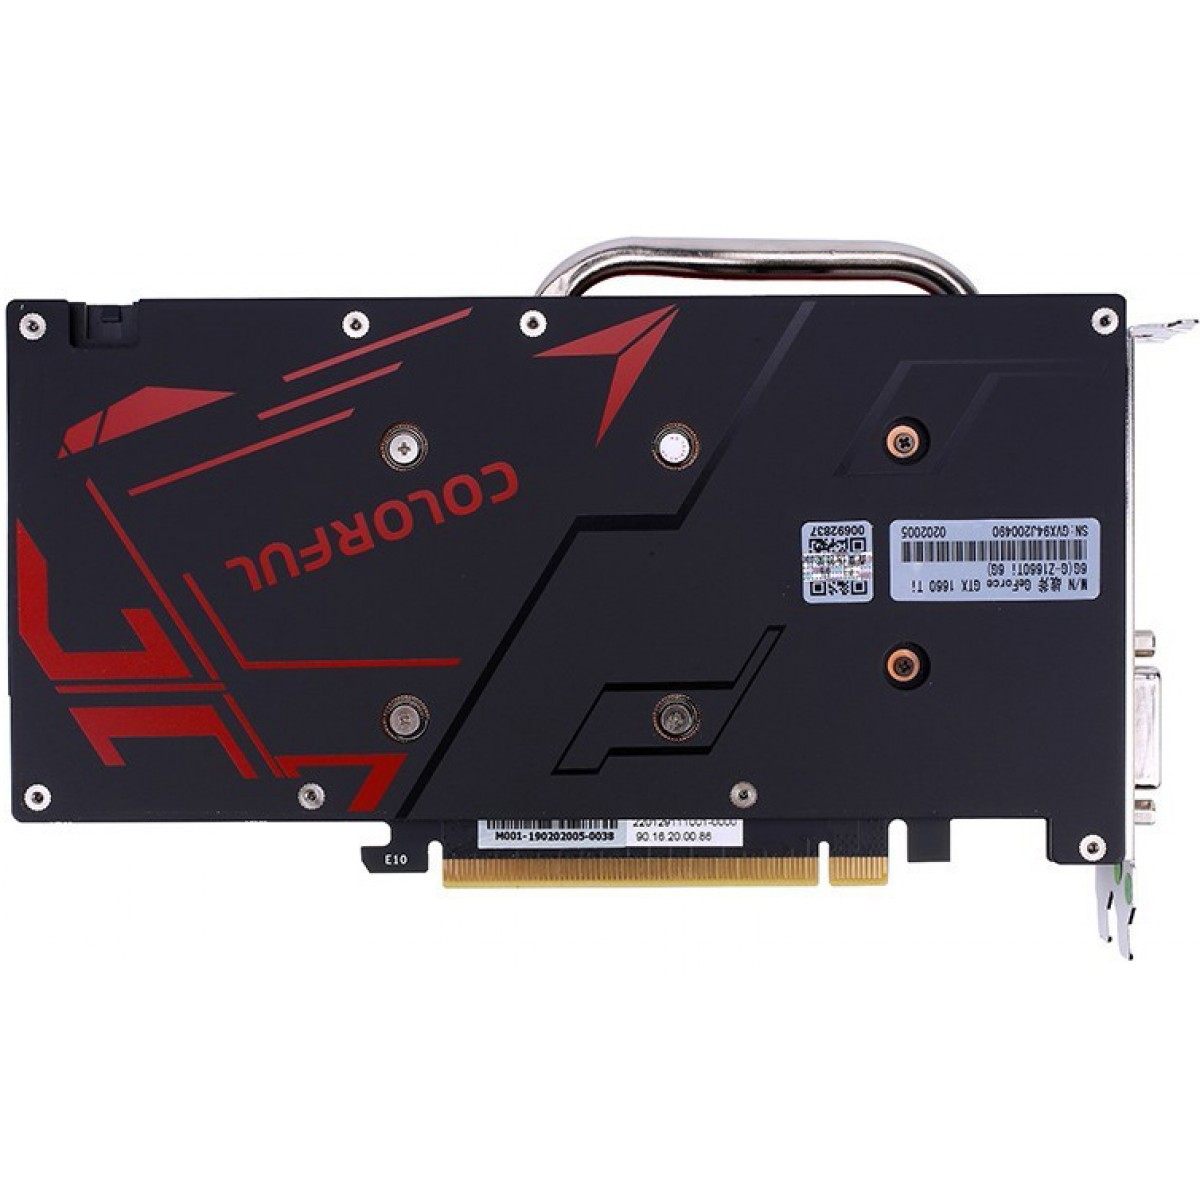 Placa de Vídeo Colorful, GeForce, GTX 1660 NB Dual, 6GB GDDR5, 192Bit, GTX 1660 NB 6G-V